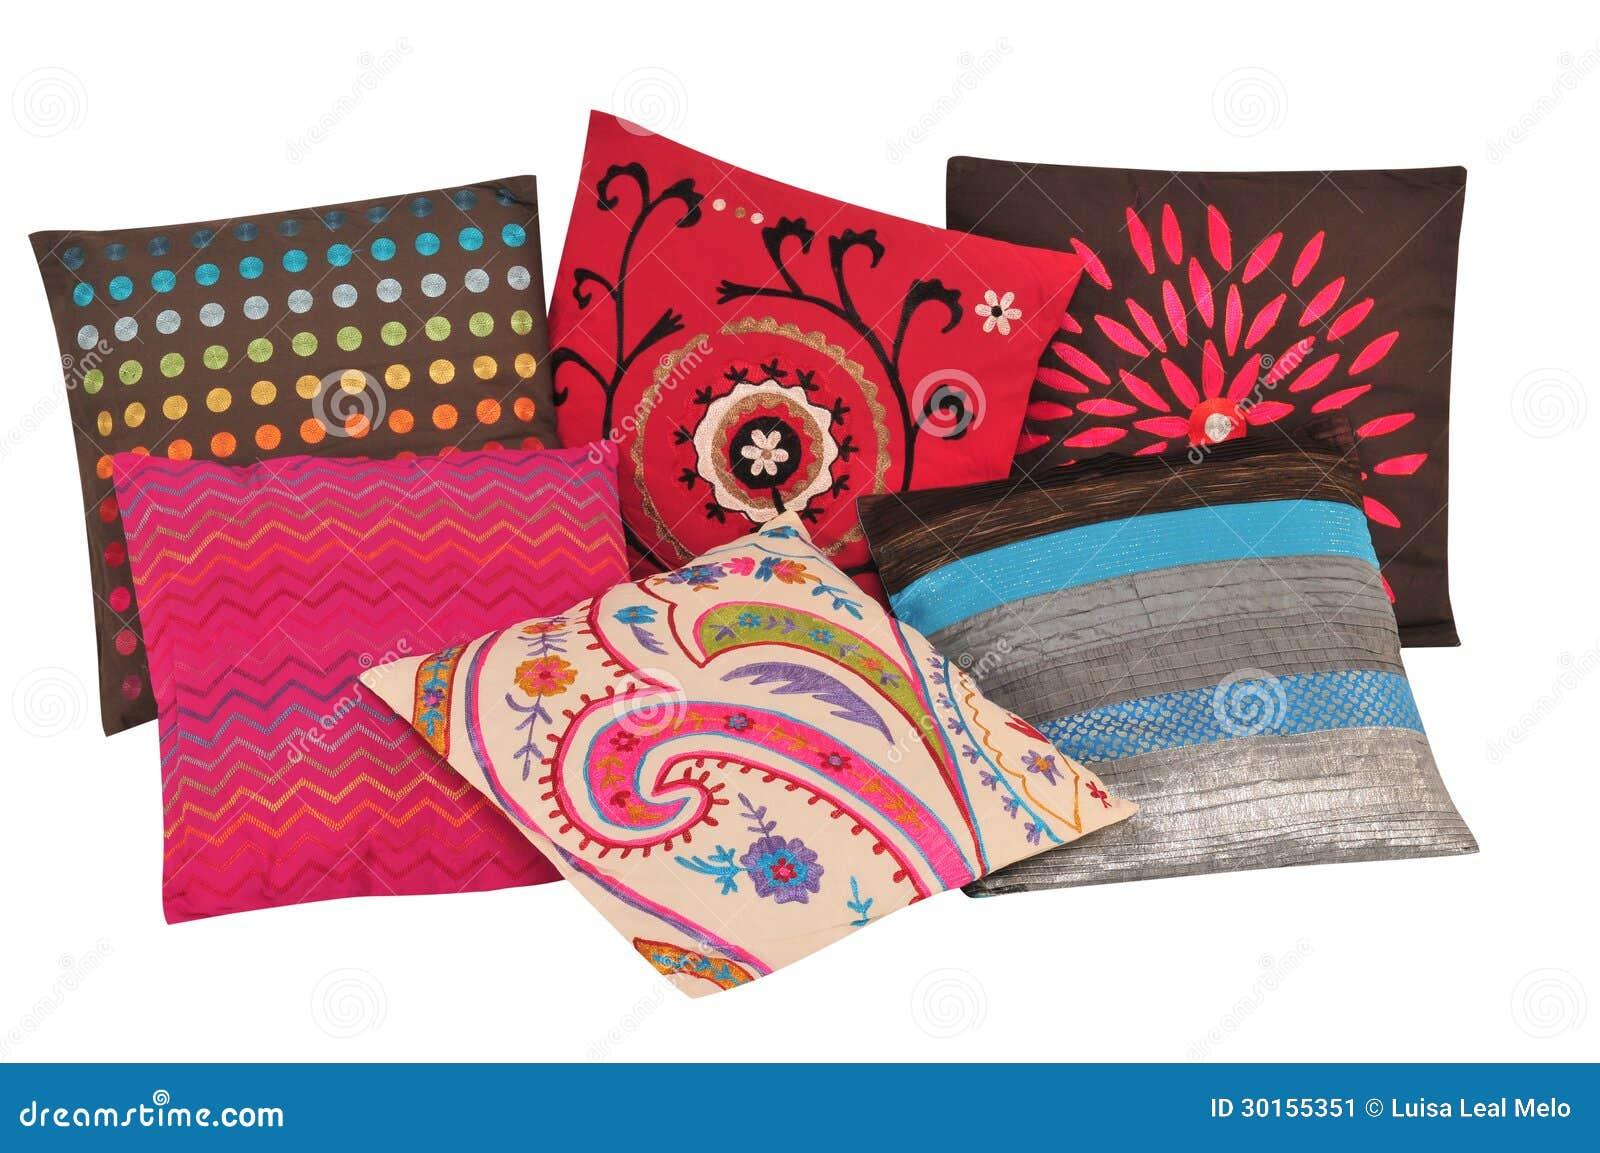 Large Soft Decorative Pillows : Cushions. Stock Image - Image: 30155351